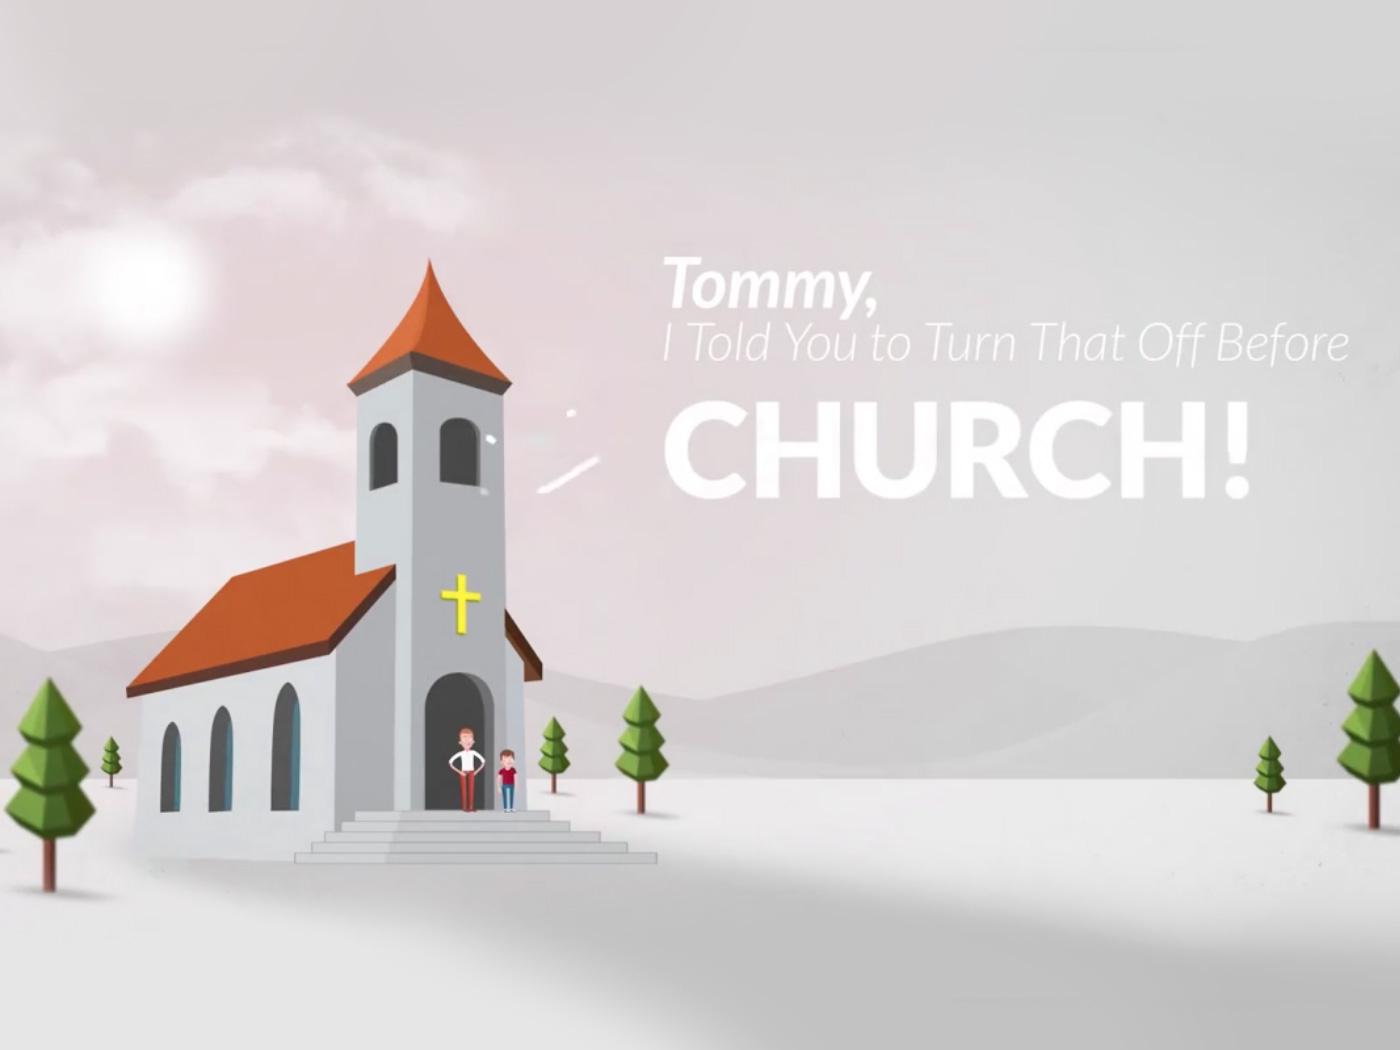 Timeout4 church